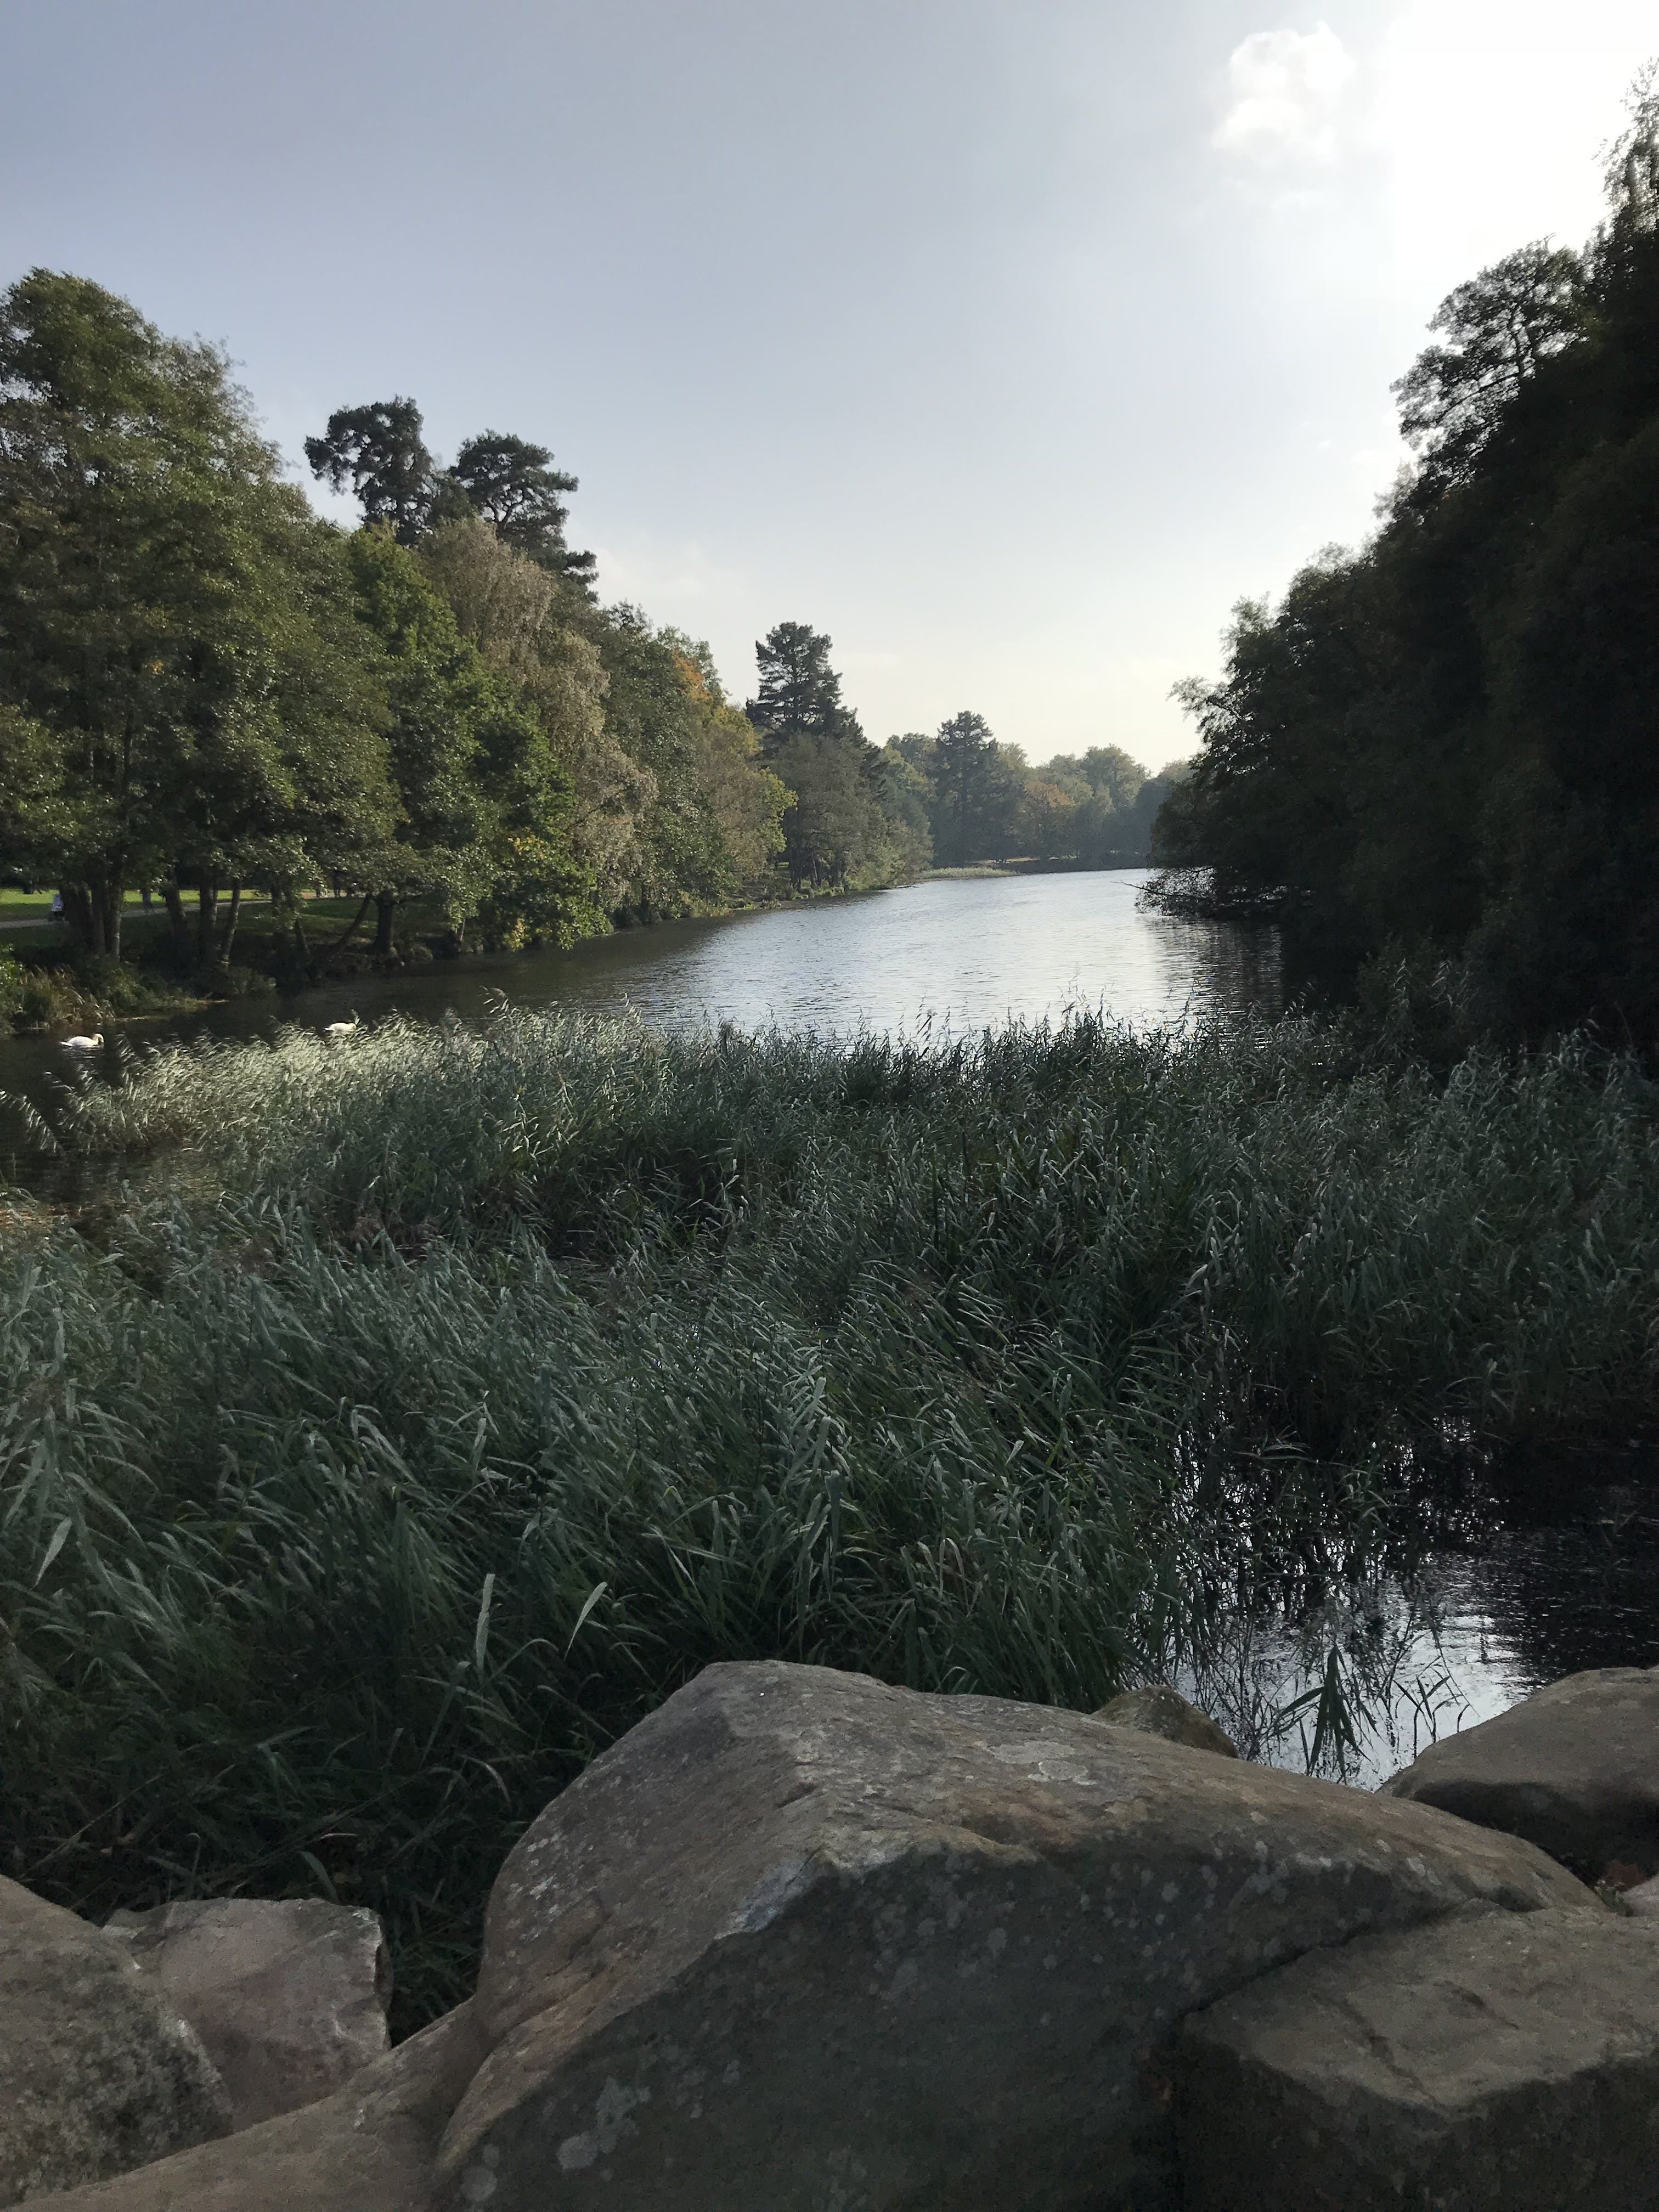 Free stock photo of lake, sky, trees